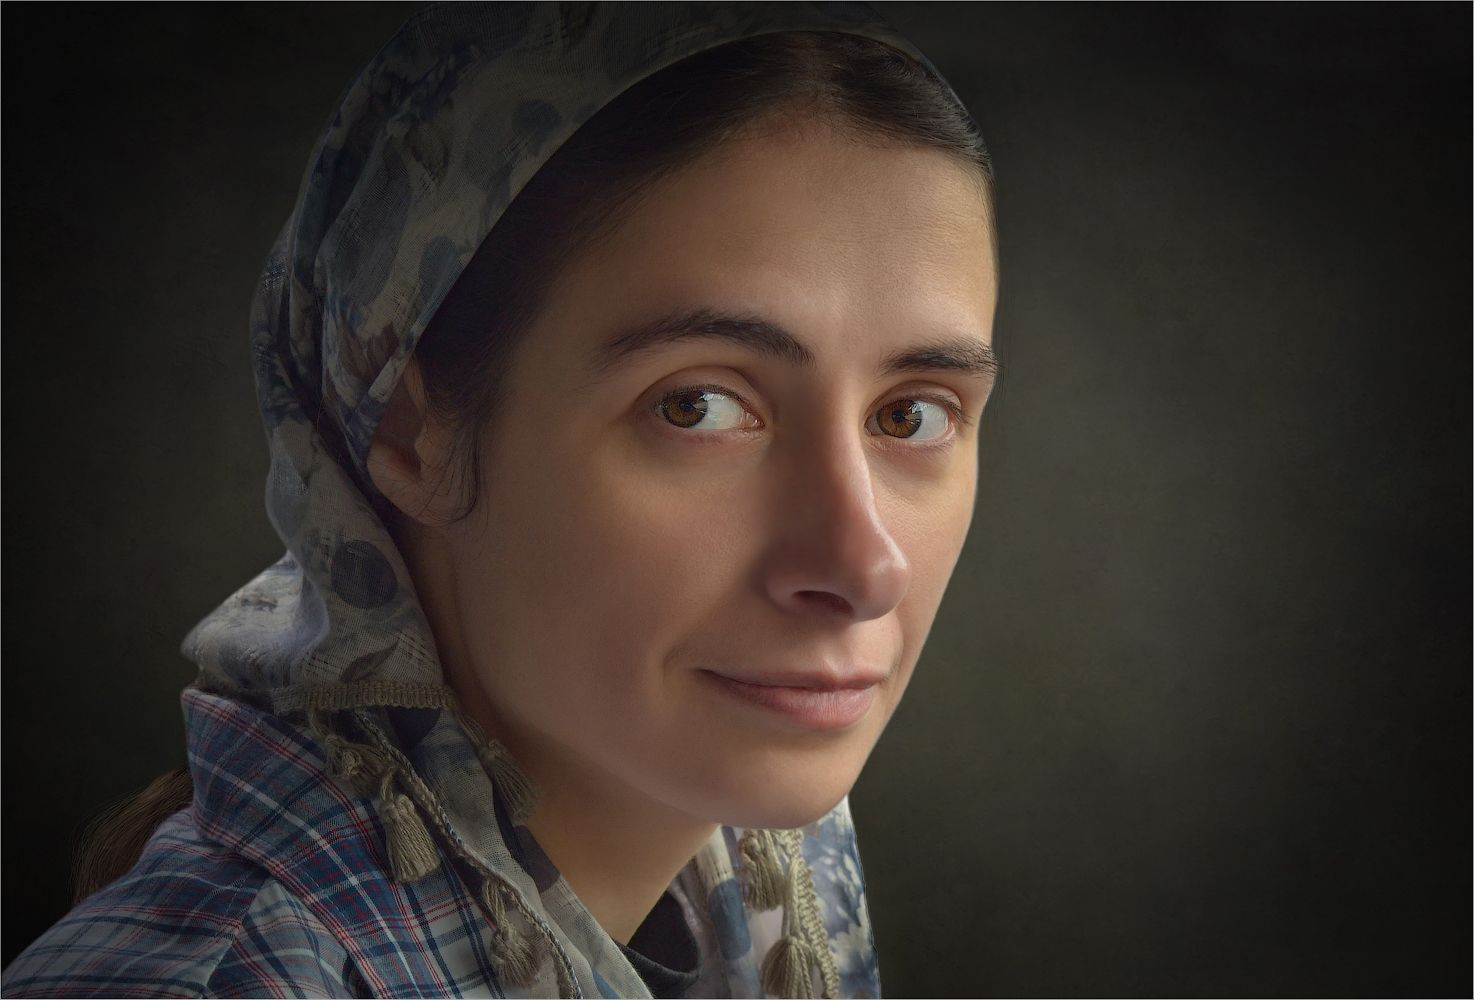 Портрет девушки портрет девушка